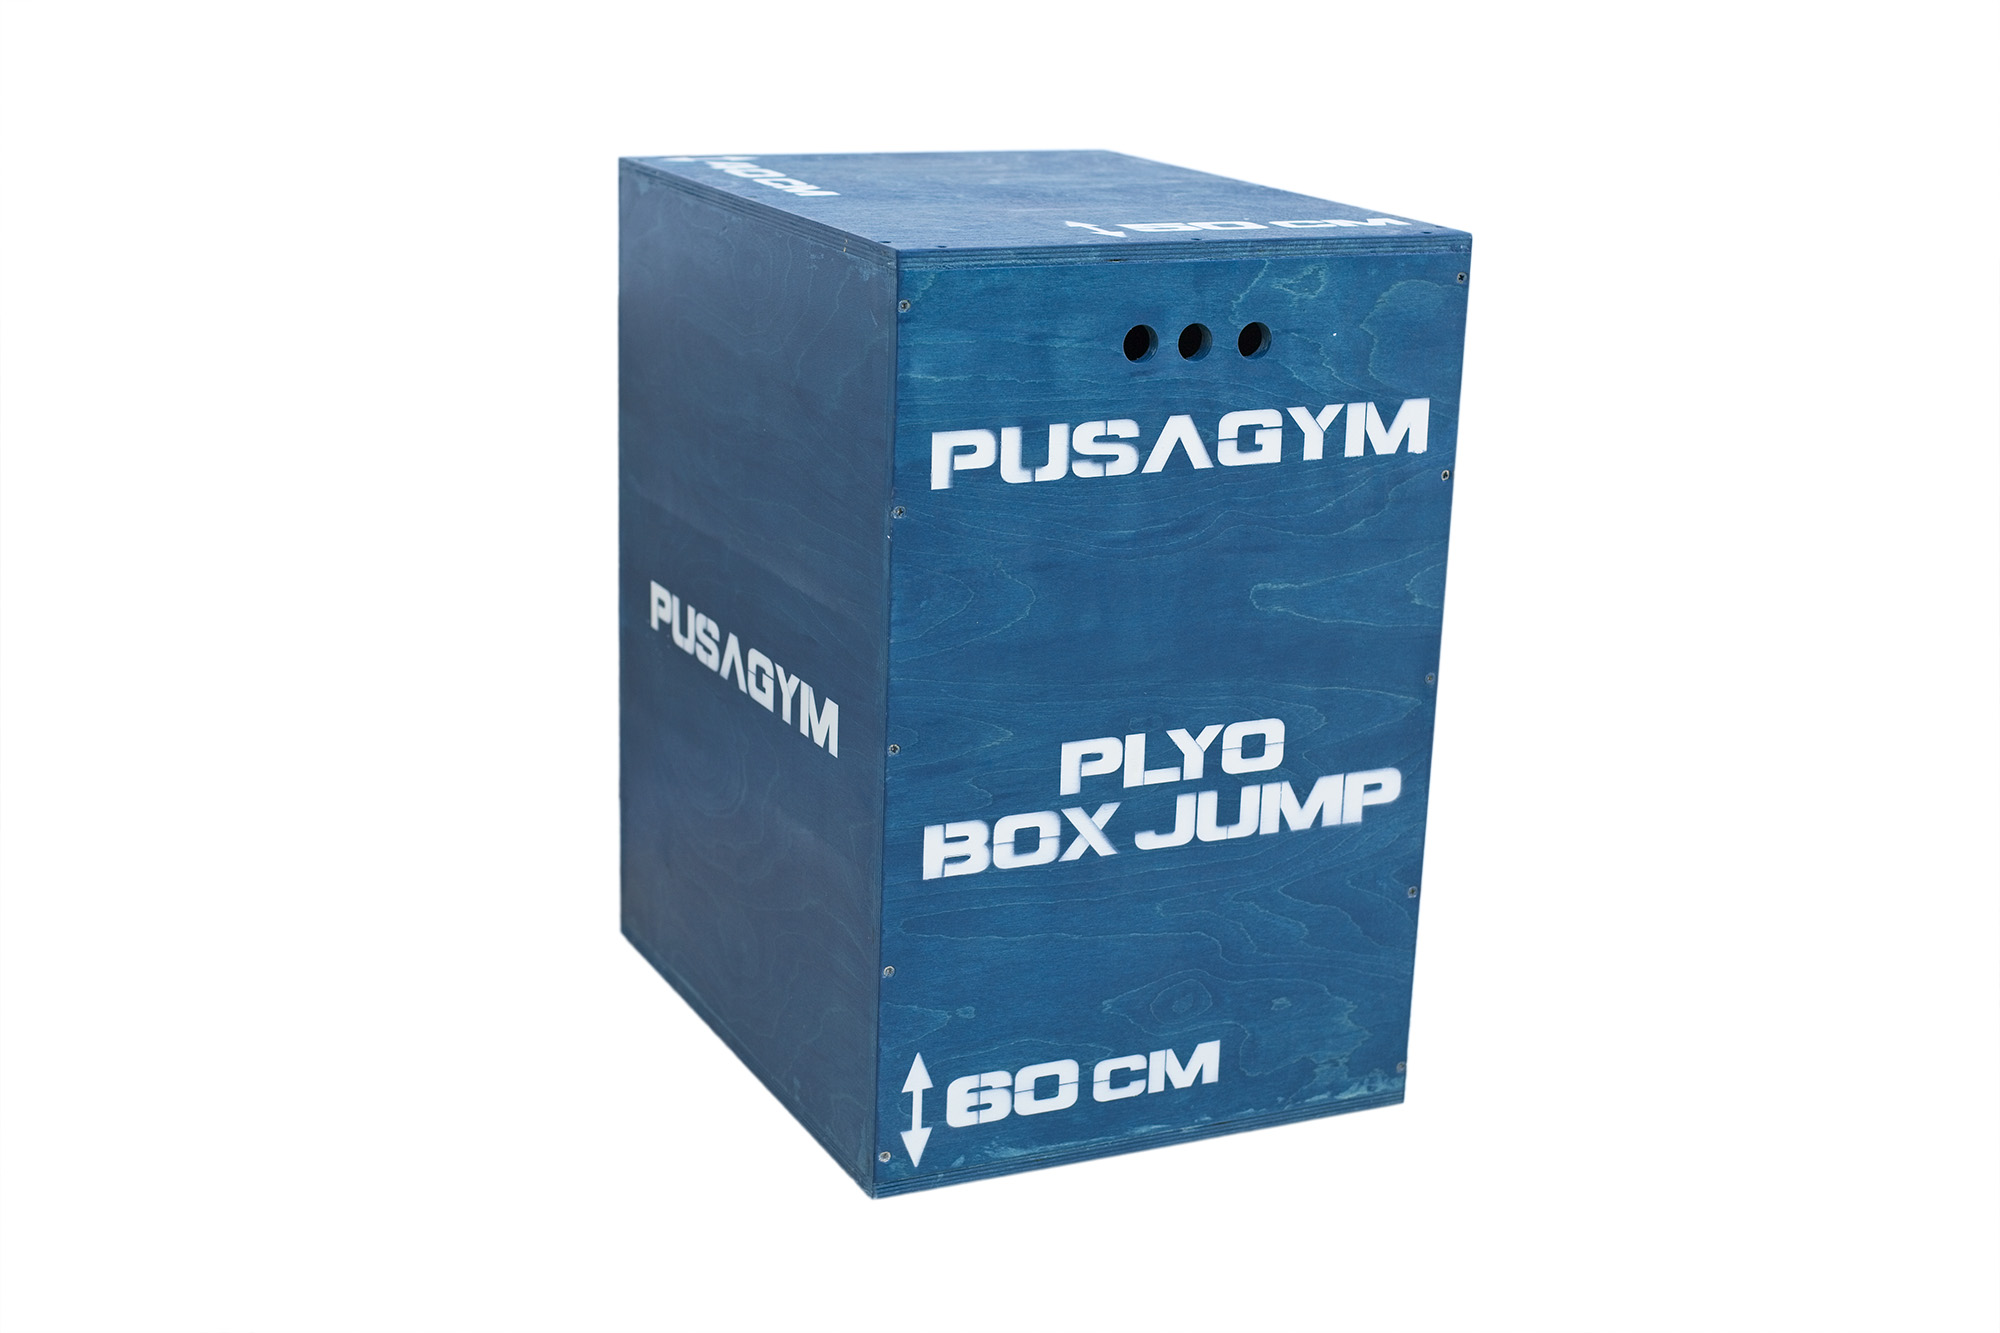 PusaGym Ply -Box Jump